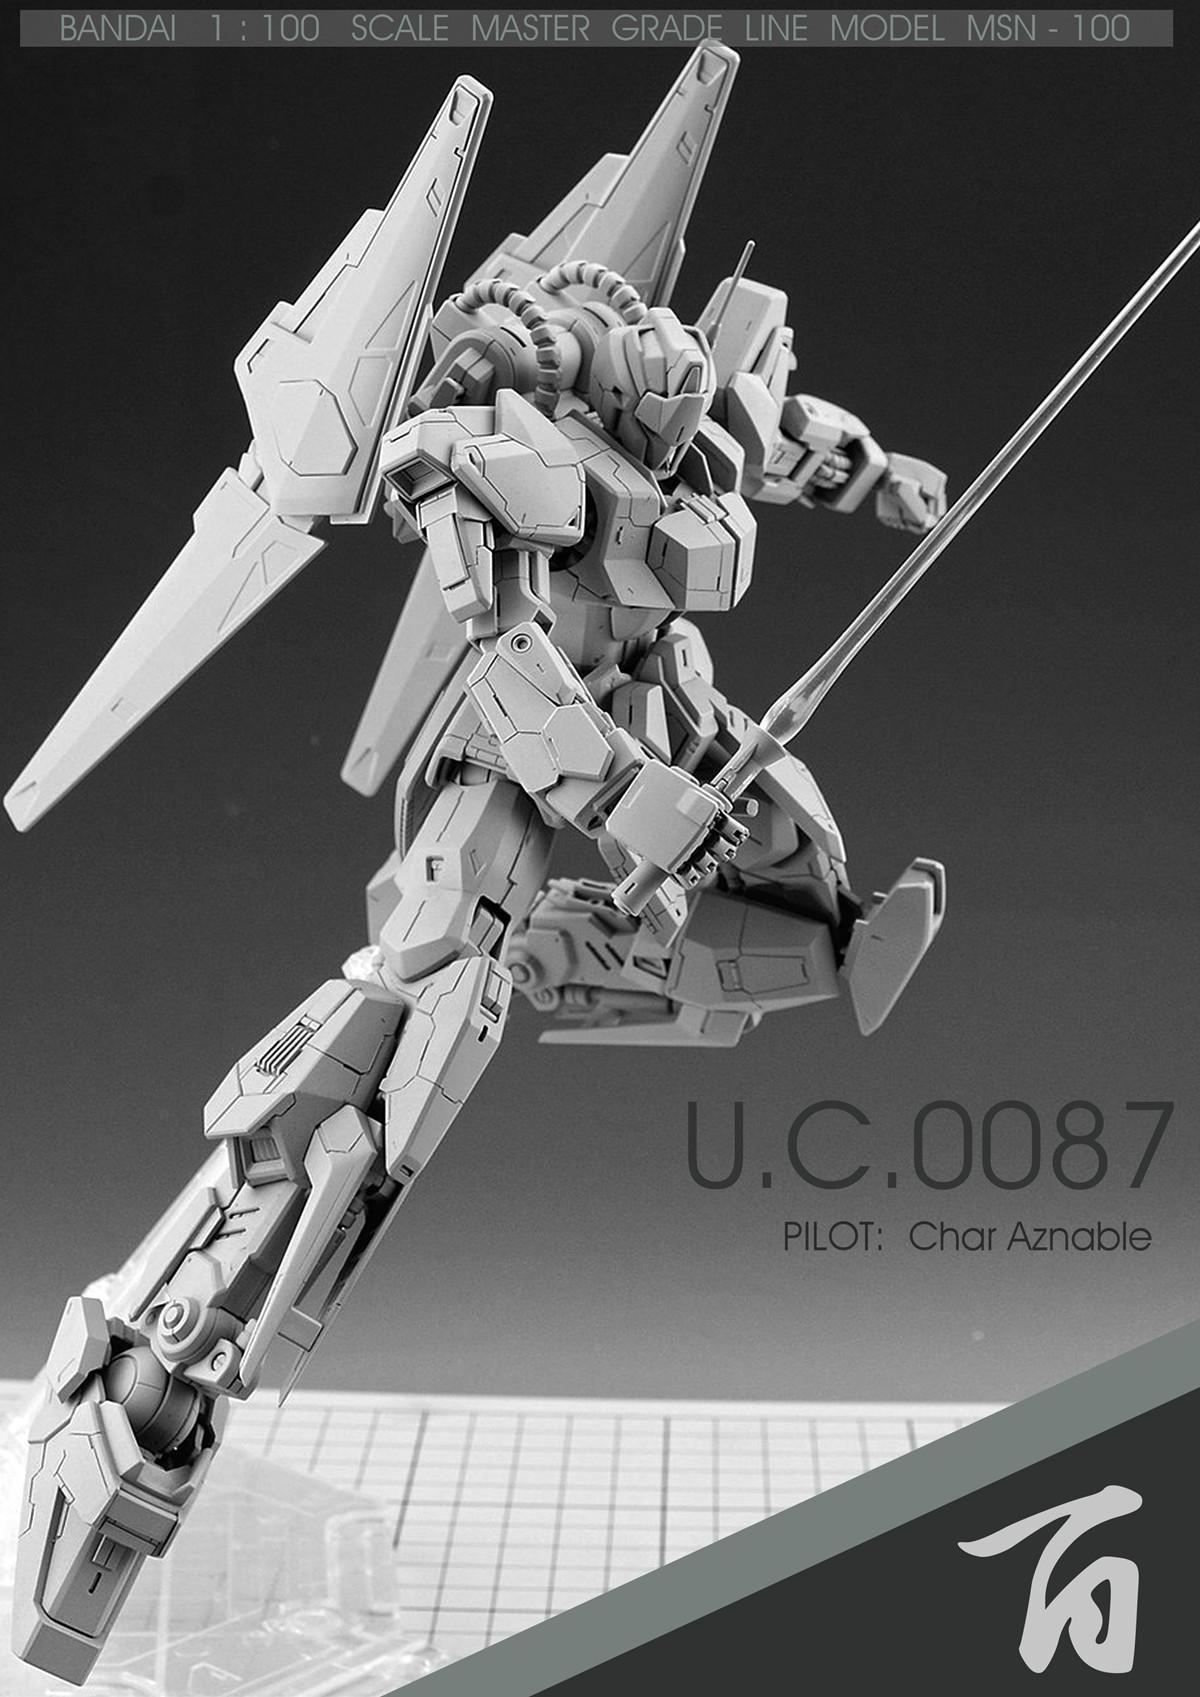 G120_hyakusiki_info_020.jpg